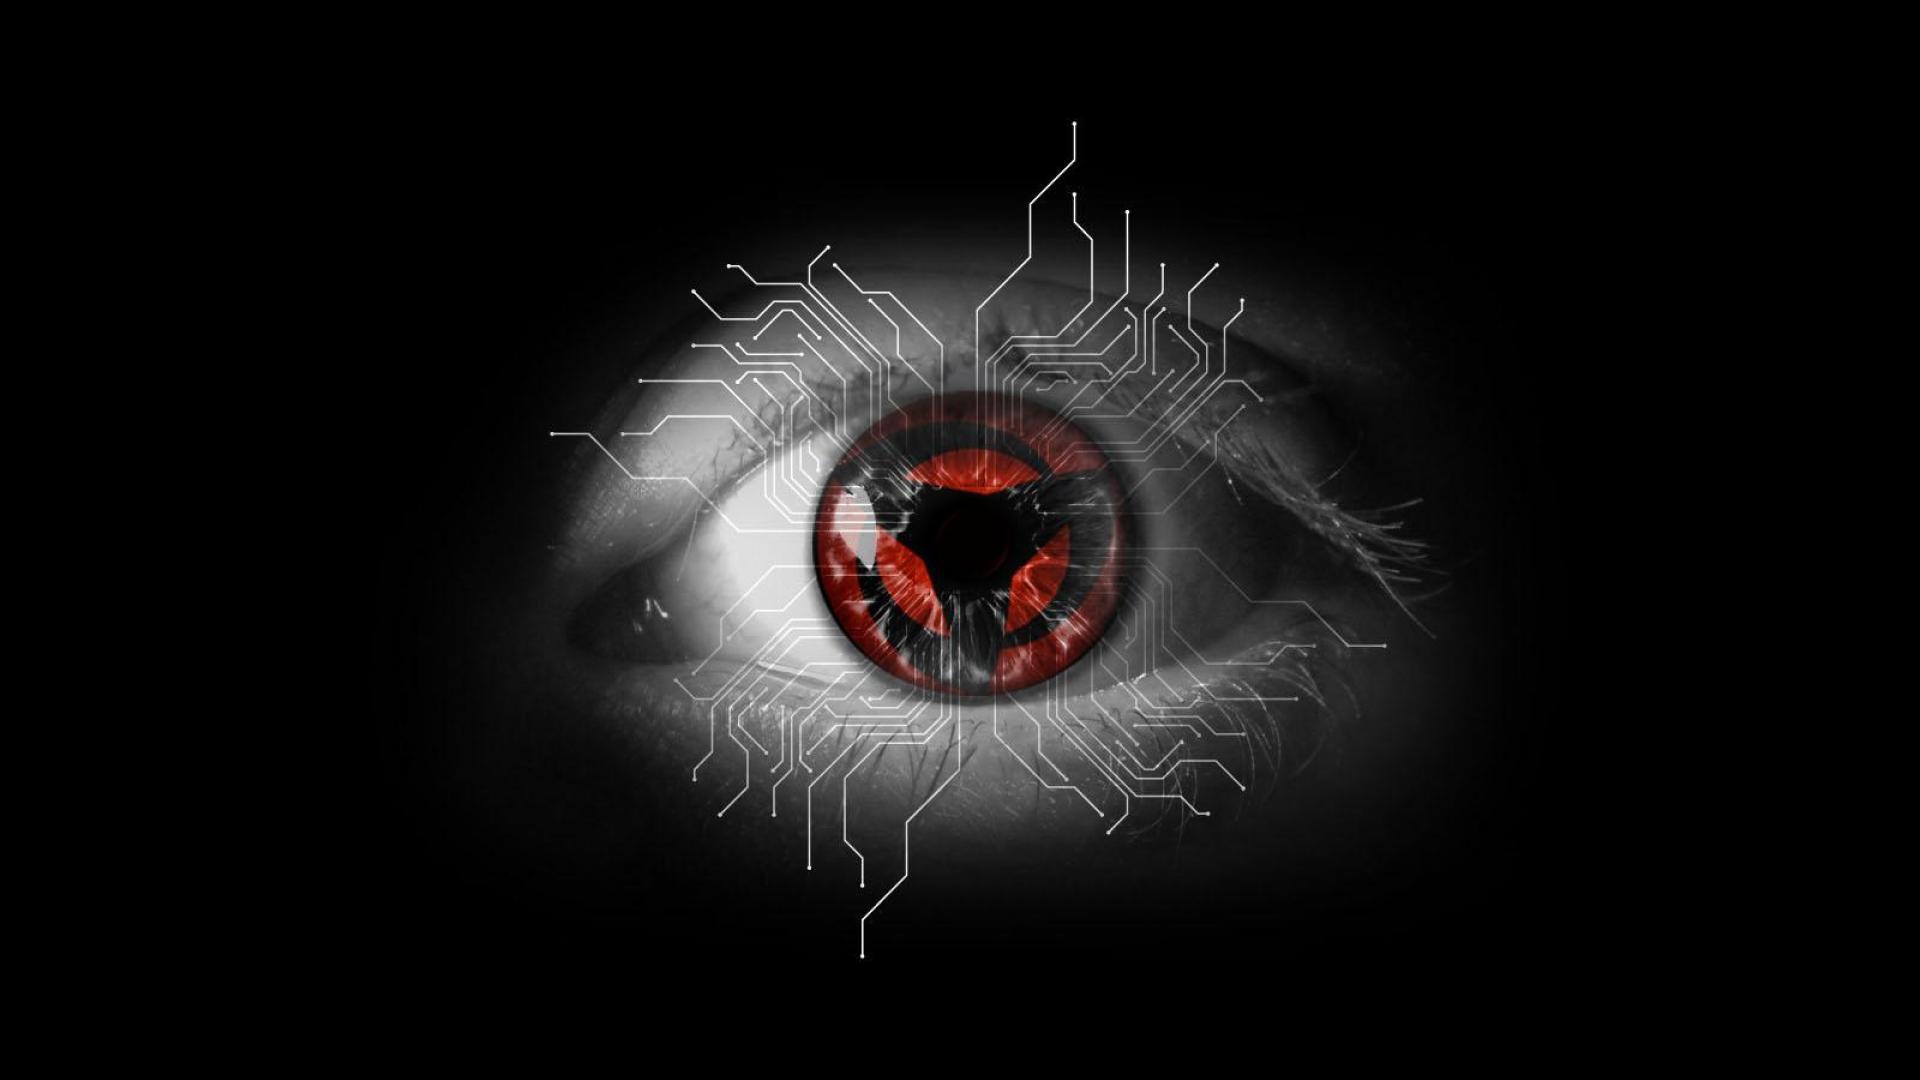 artisic-eyes-Google-zoeken-wallpaper-wp3802537